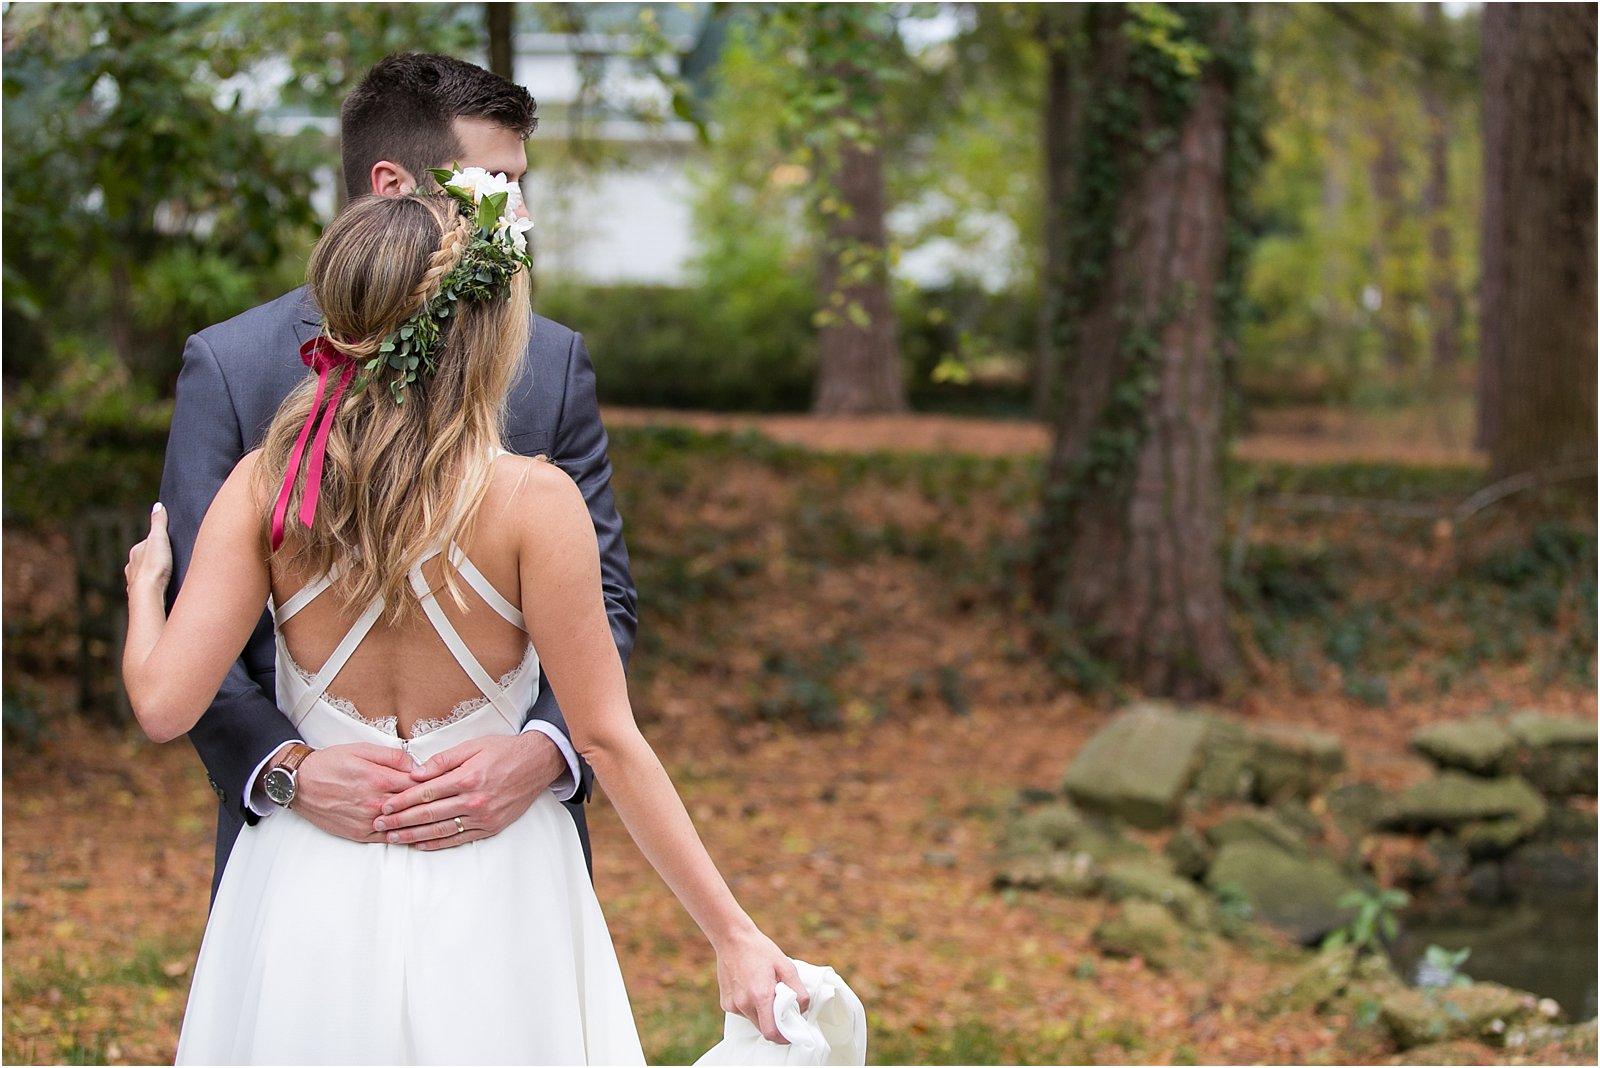 jessica_ryan_photography_womans_club_of_portsmouth_wedding_walk_through_a_wedding_bride_and_groom_0213